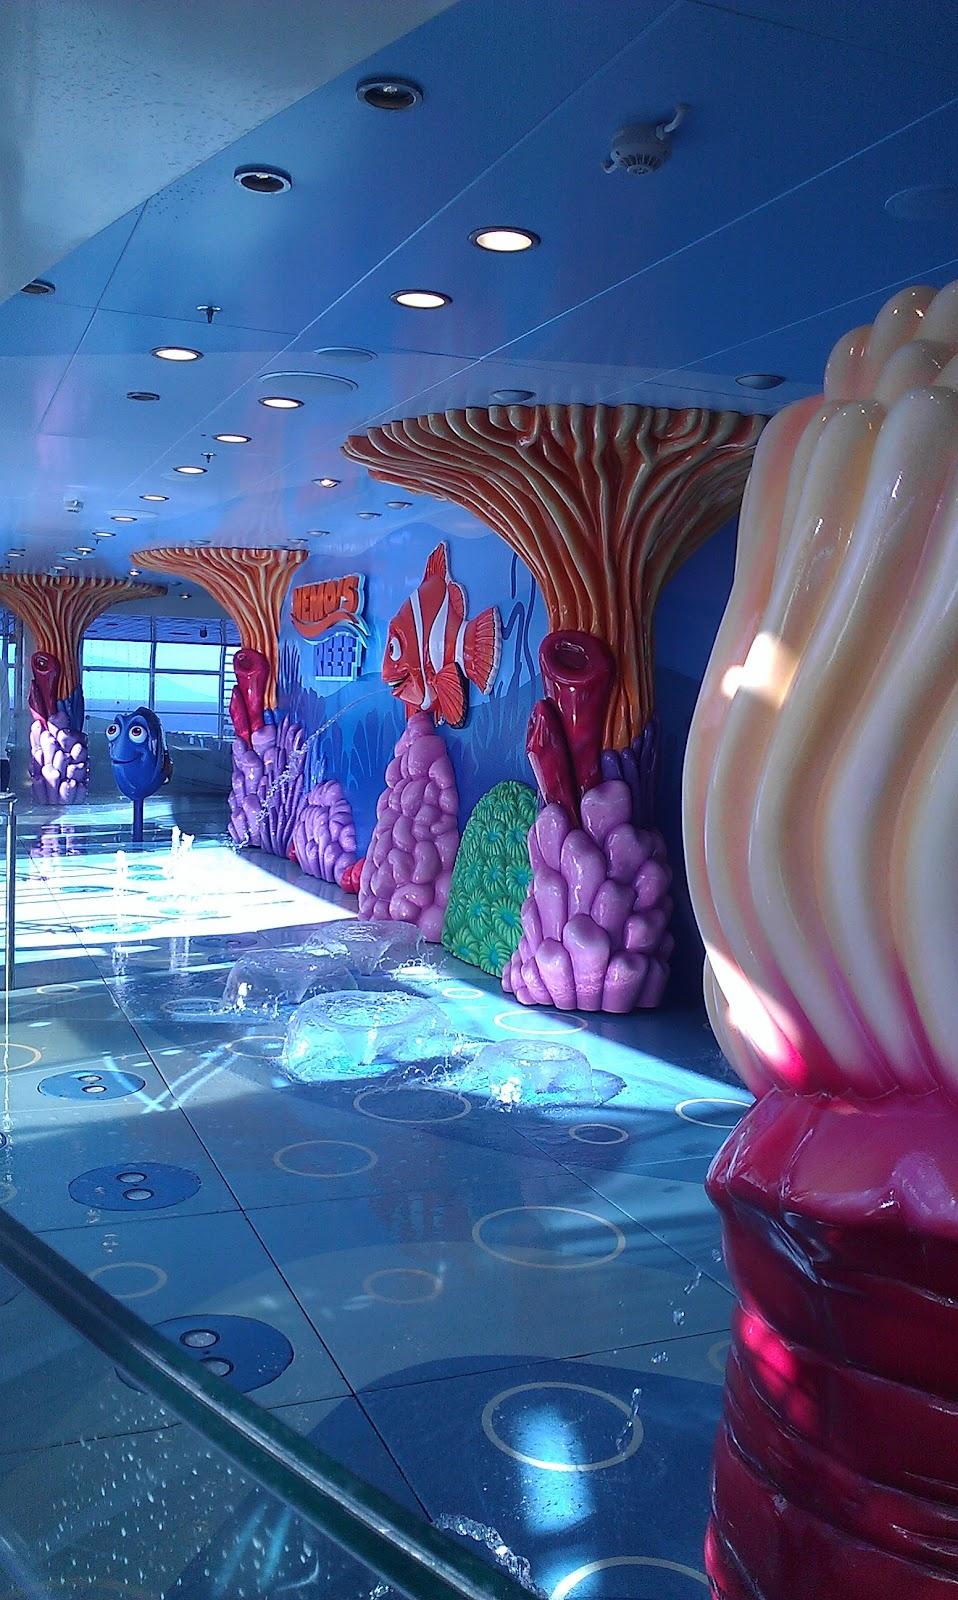 Nemo's splash pad Disney Fantasy Cruise ship